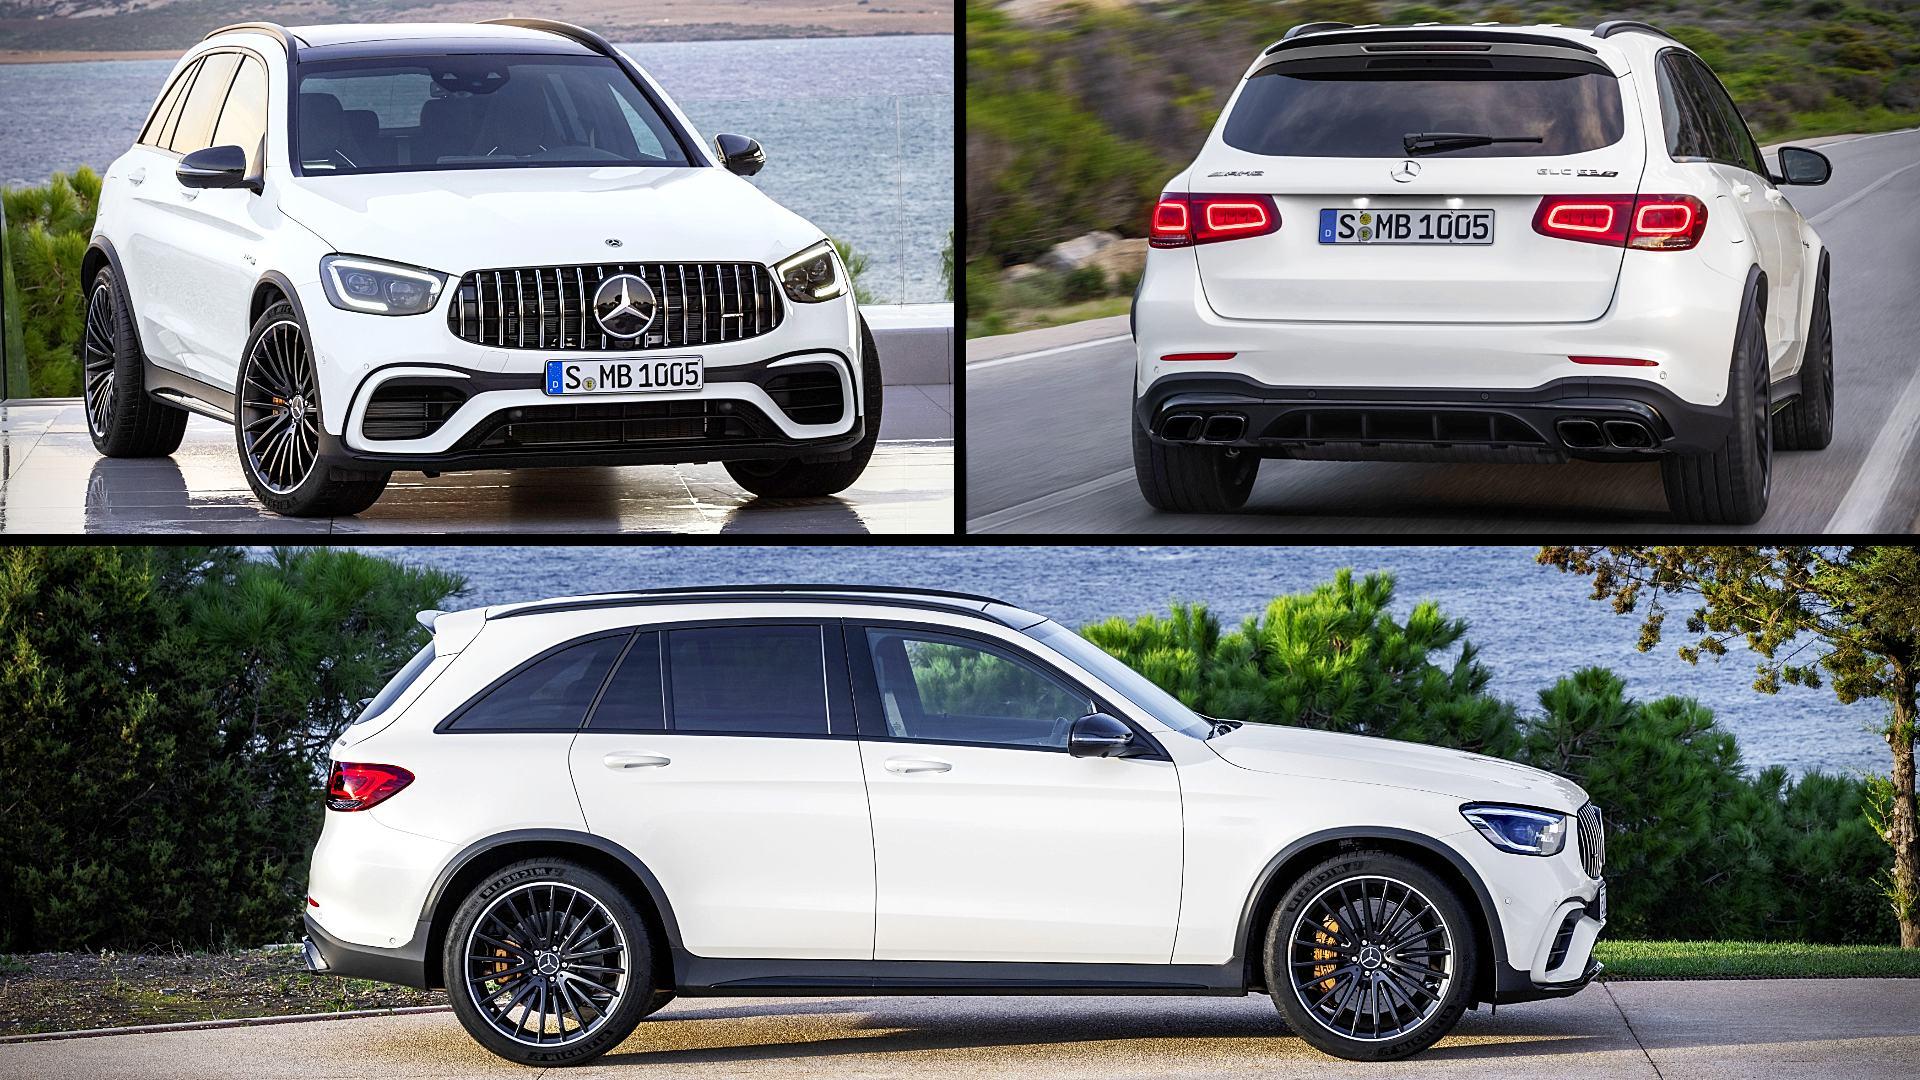 2020 Mercedes Amg Glc 63 S White Suv Images